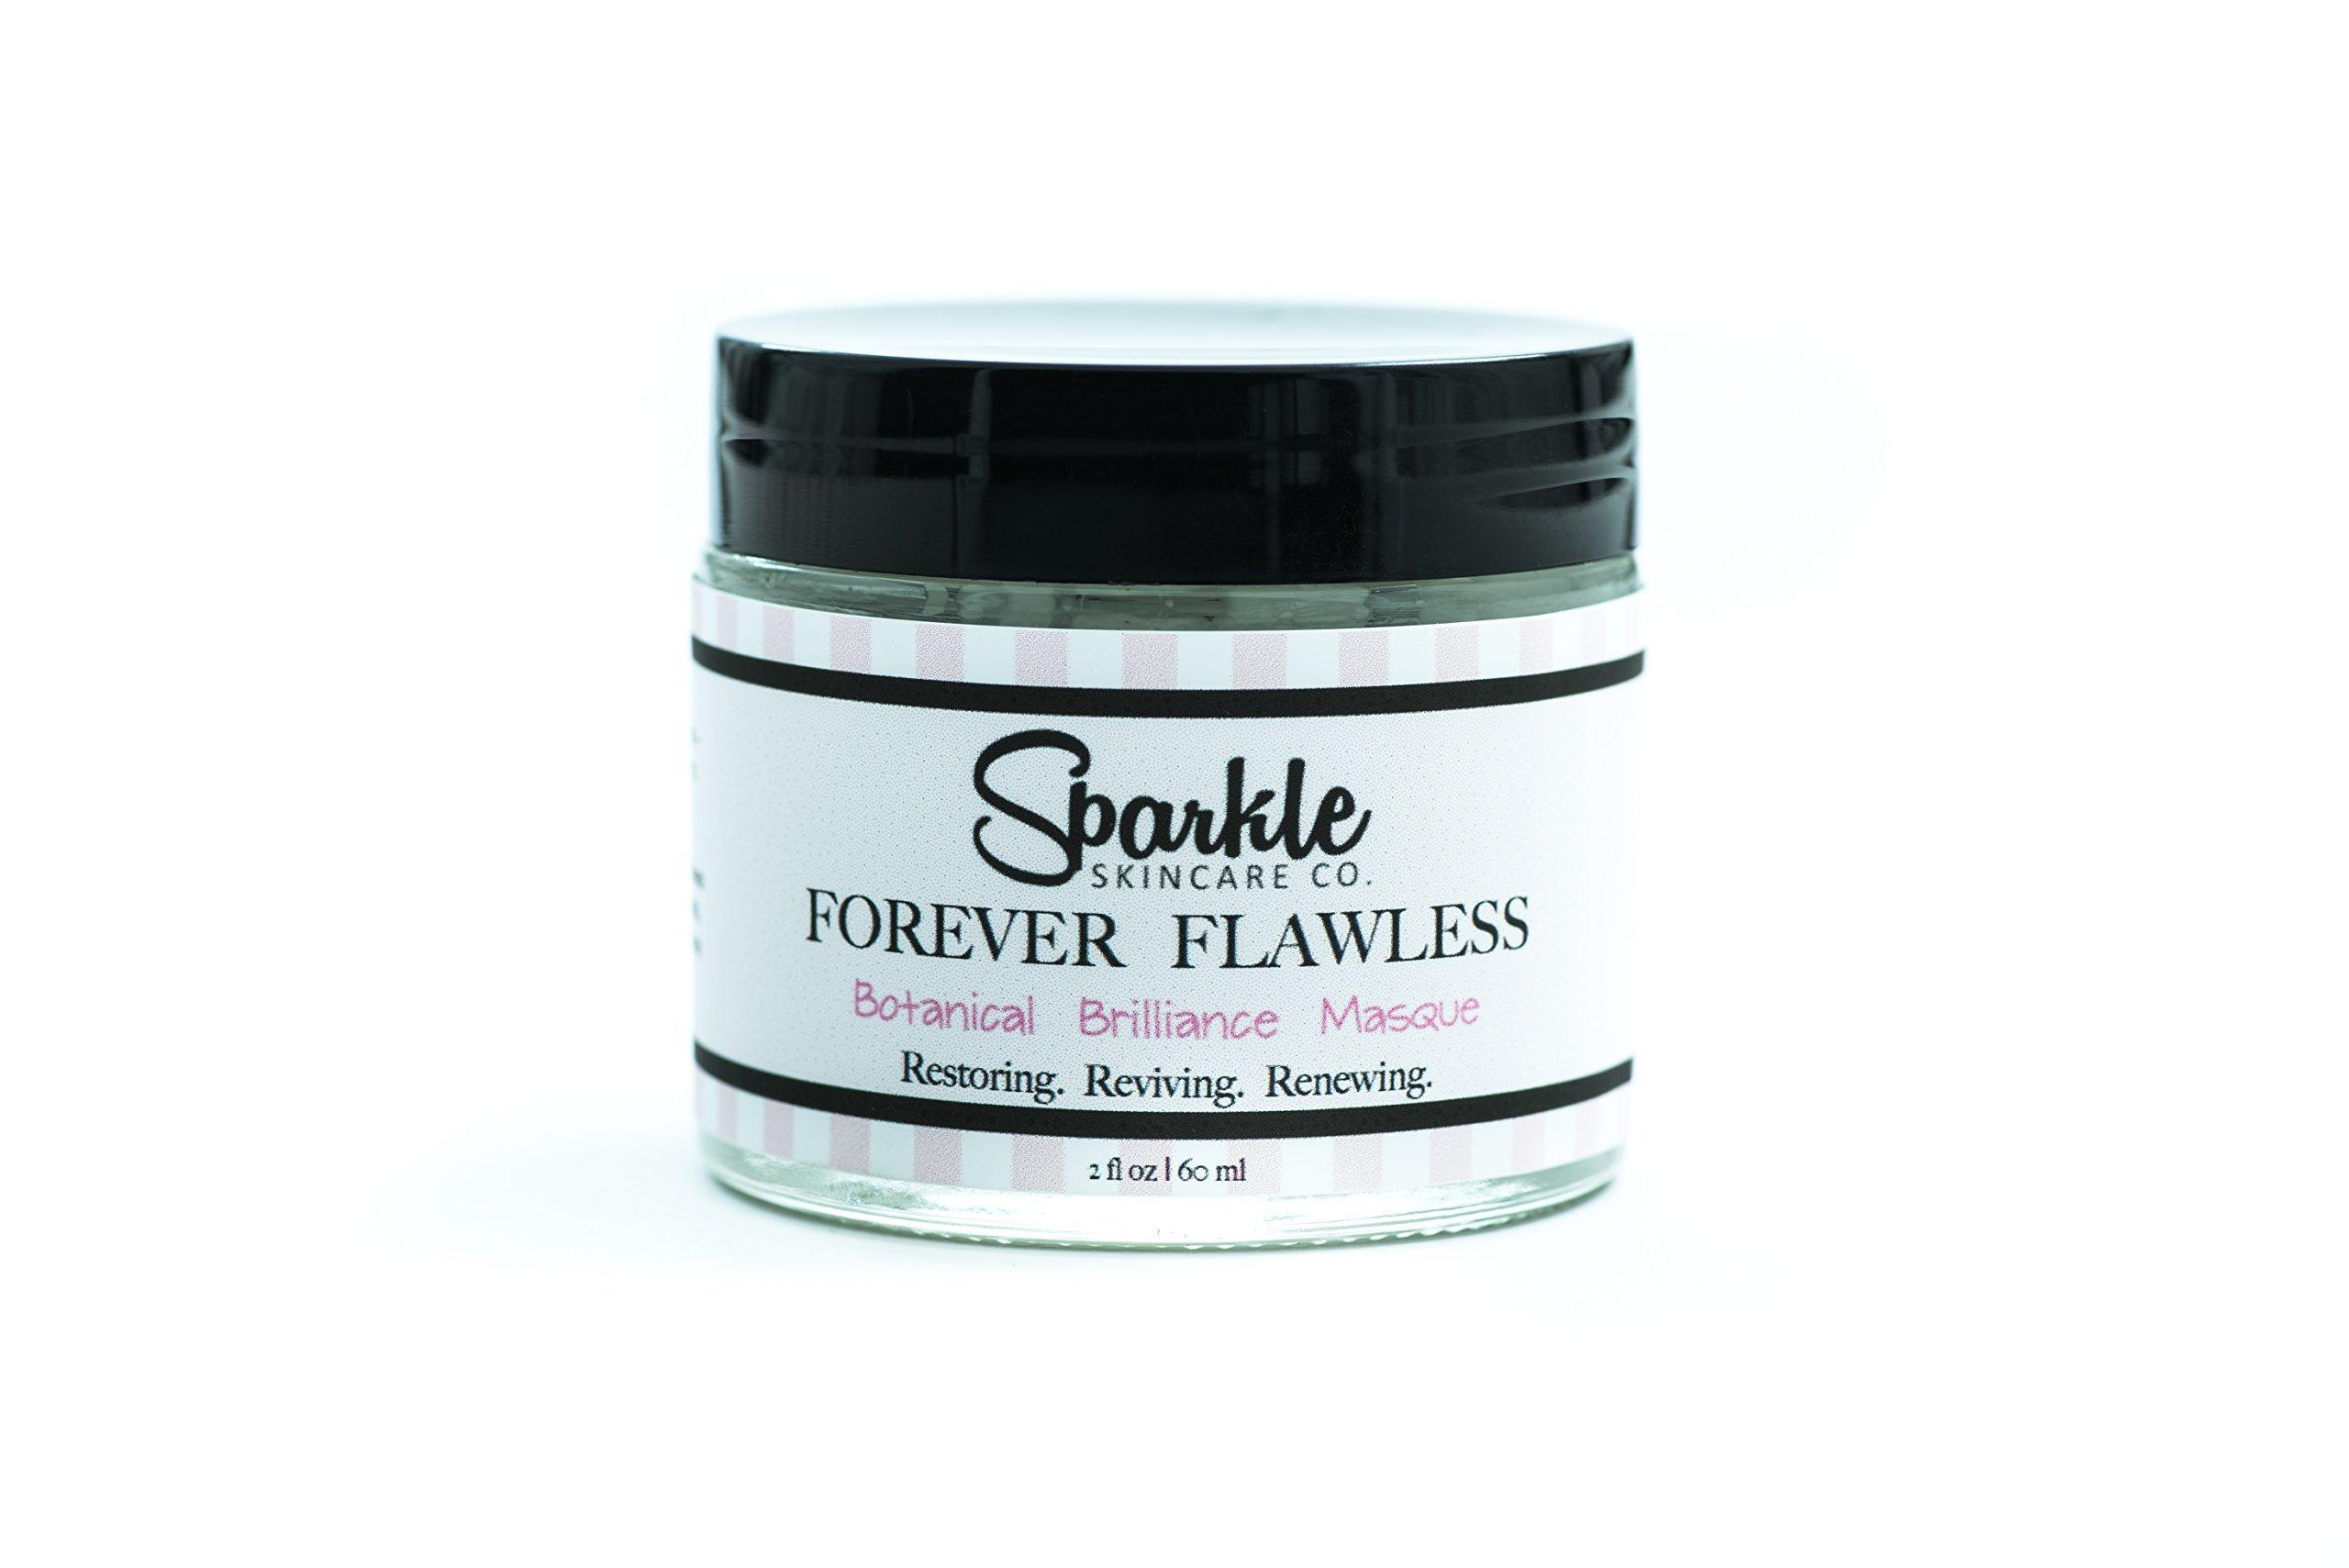 Enzyme Mask, Fade Dark Spots, Antioxidant, Anti Acne, Exfoliate, Boost Collagen, Paraben Free, 2 oz